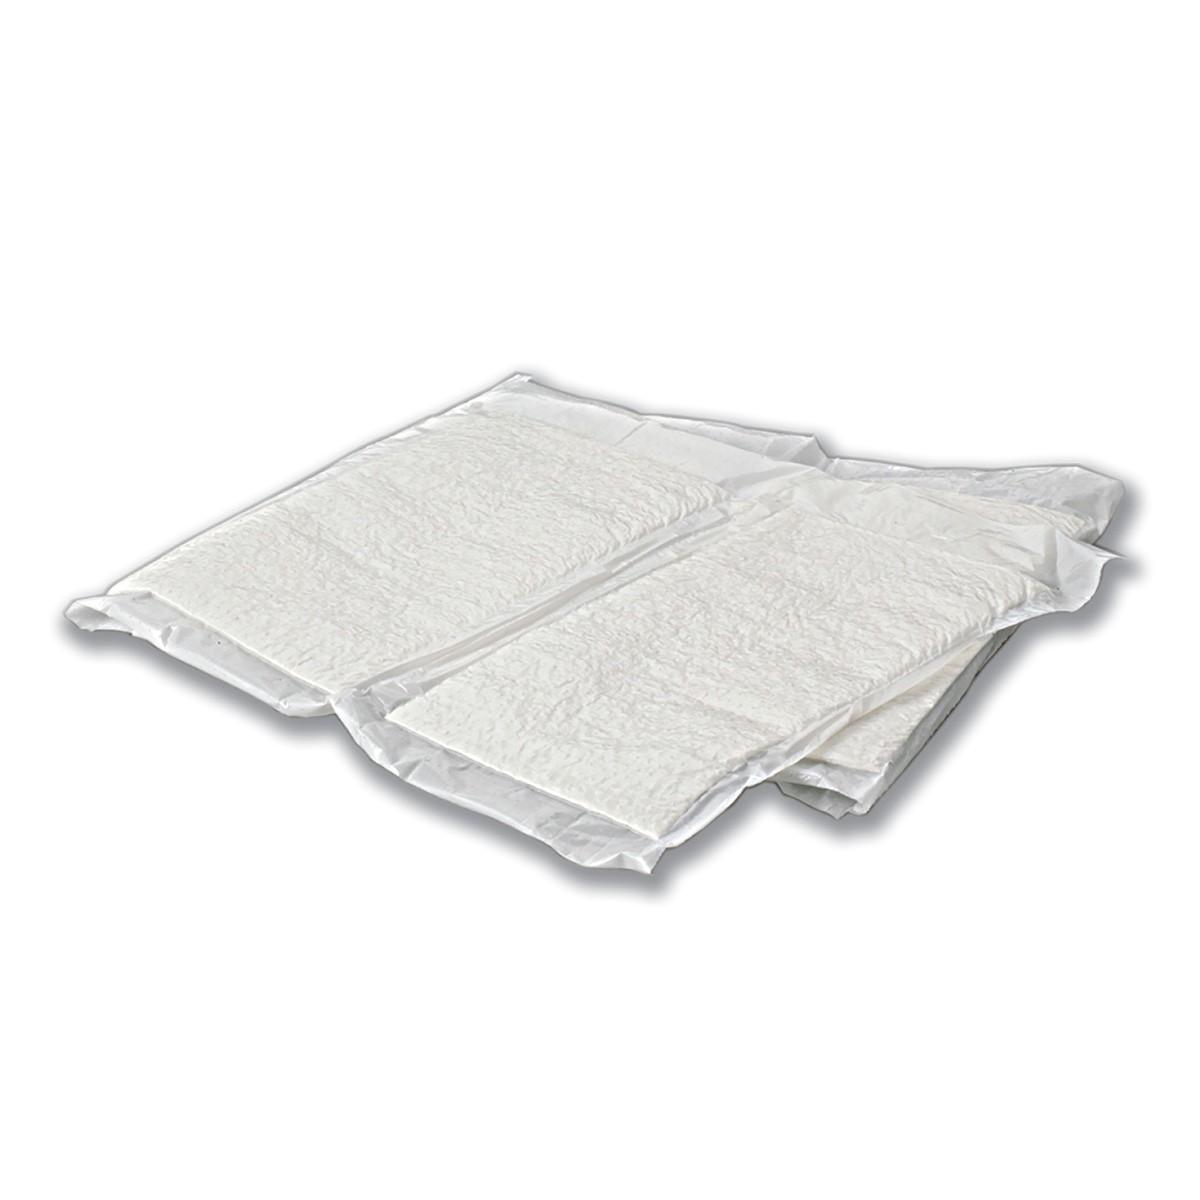 Soak-Up Pad 4x7in - White | 3500pcs